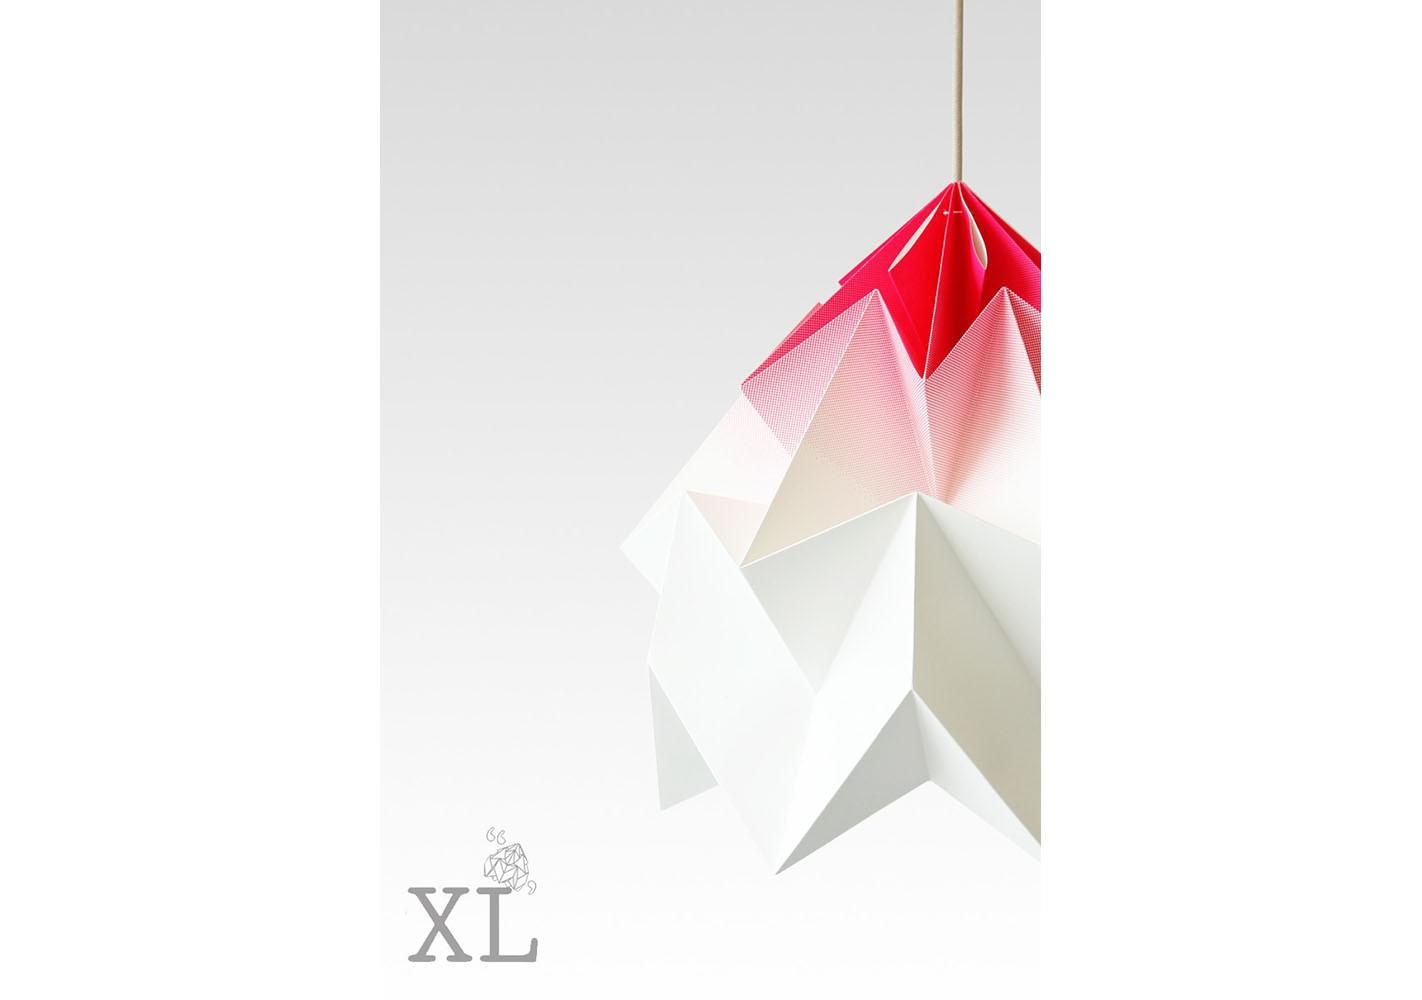 Abat-jour gradient MOTH XL- STUDIO SNOWPUPPE